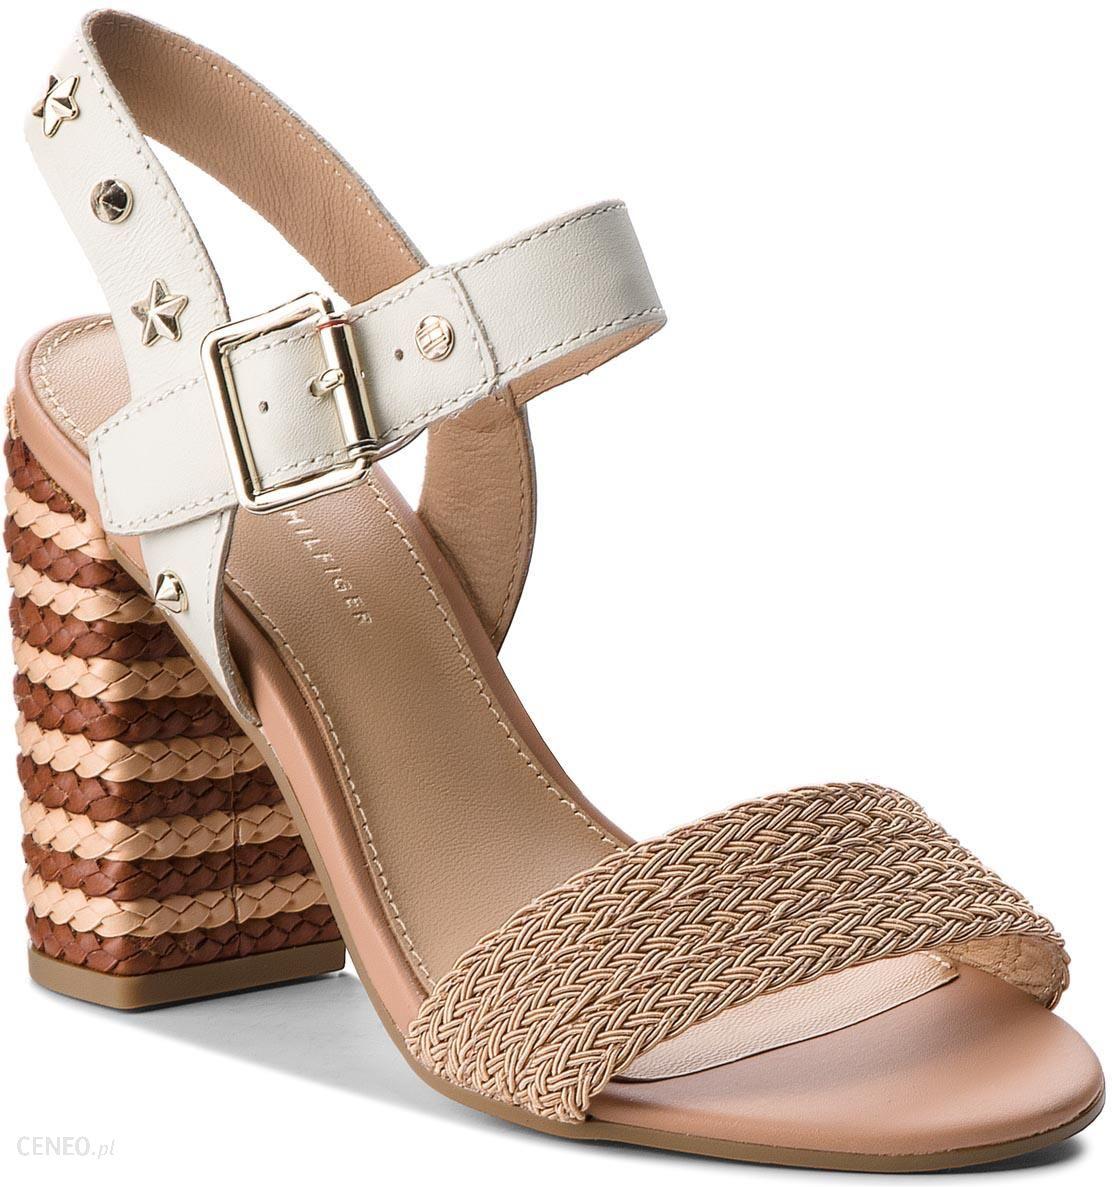 a2ff24c4ddd7b Sandały TOMMY HILFIGER - Feminine Heel Sandal Star Studs FW0FW02254 Whisper  White 121 - zdjęcie 1